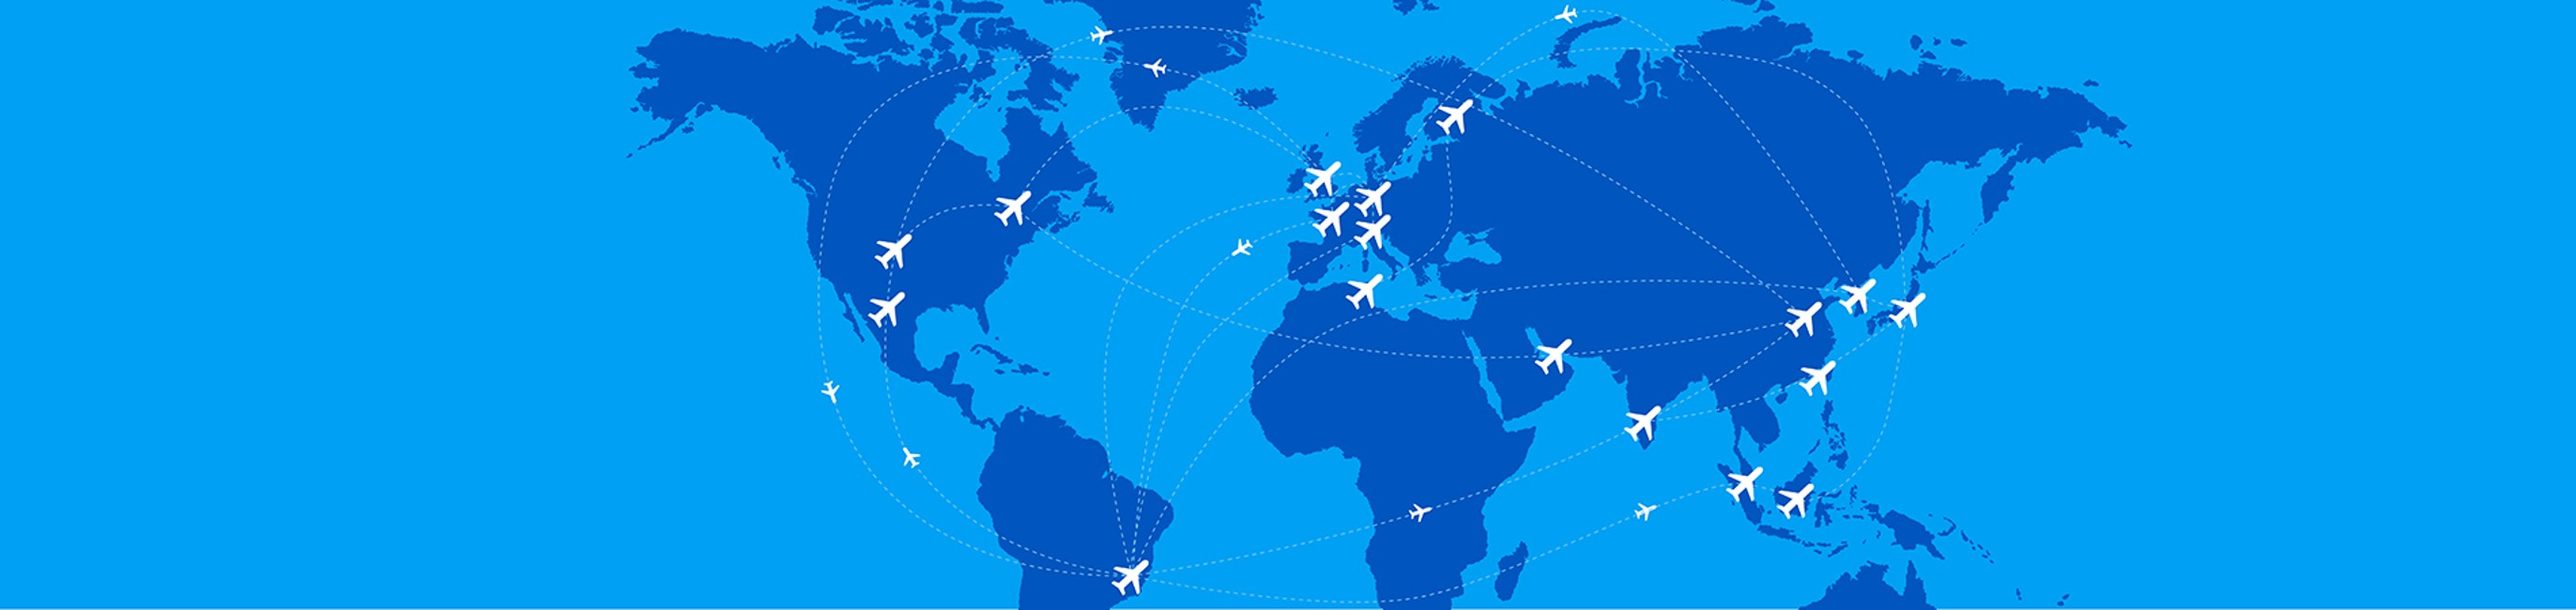 thyssenkrupp Aerospace offers local services – worldwide